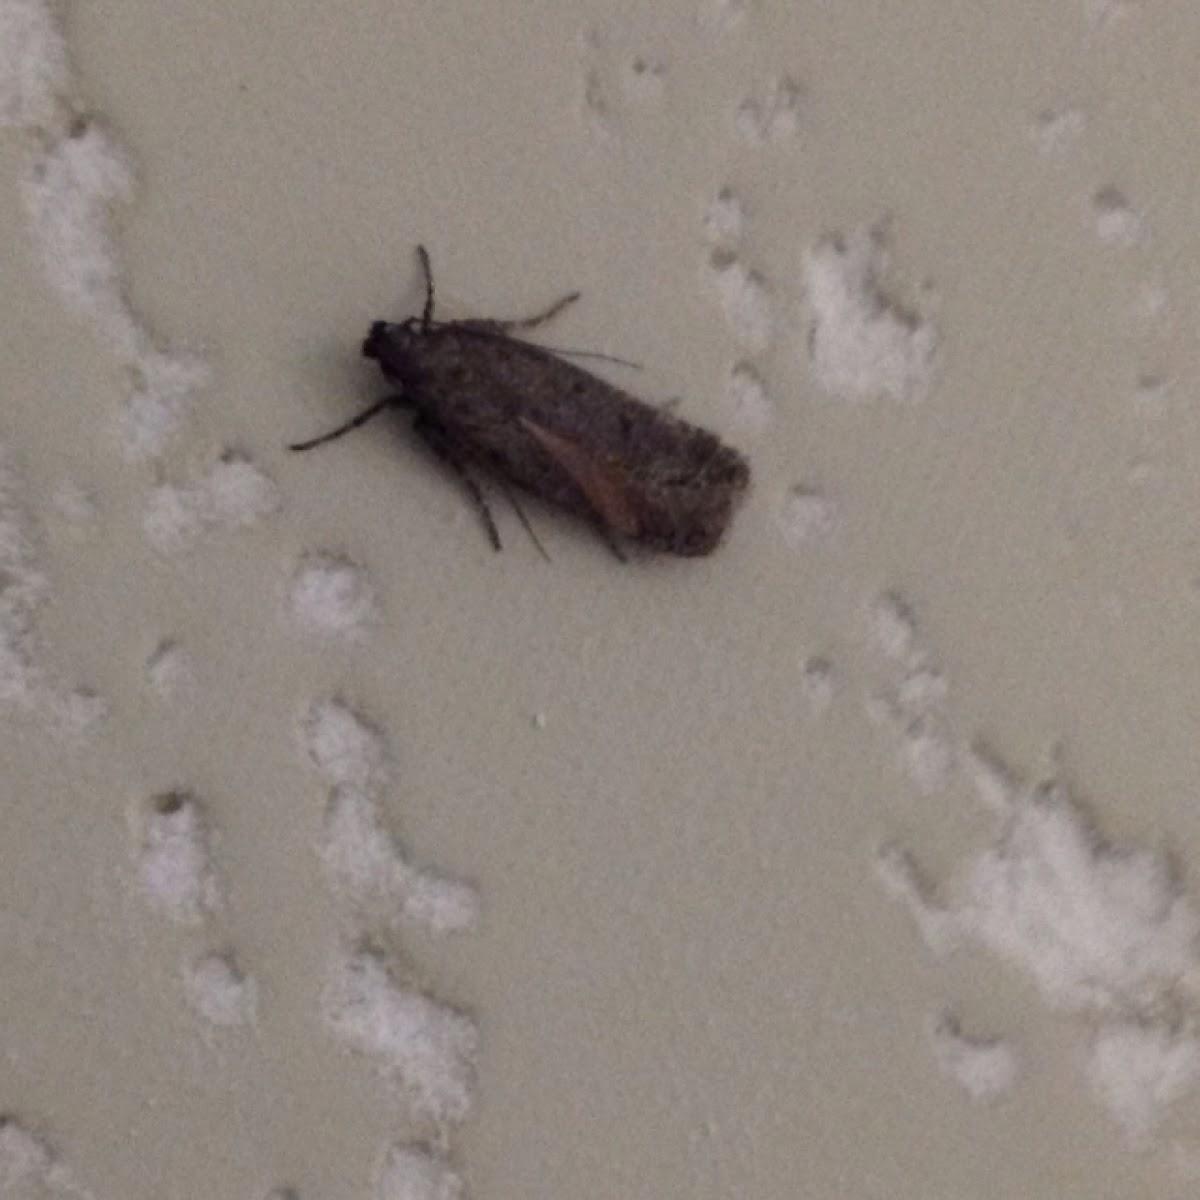 Dull Flatbody Moth